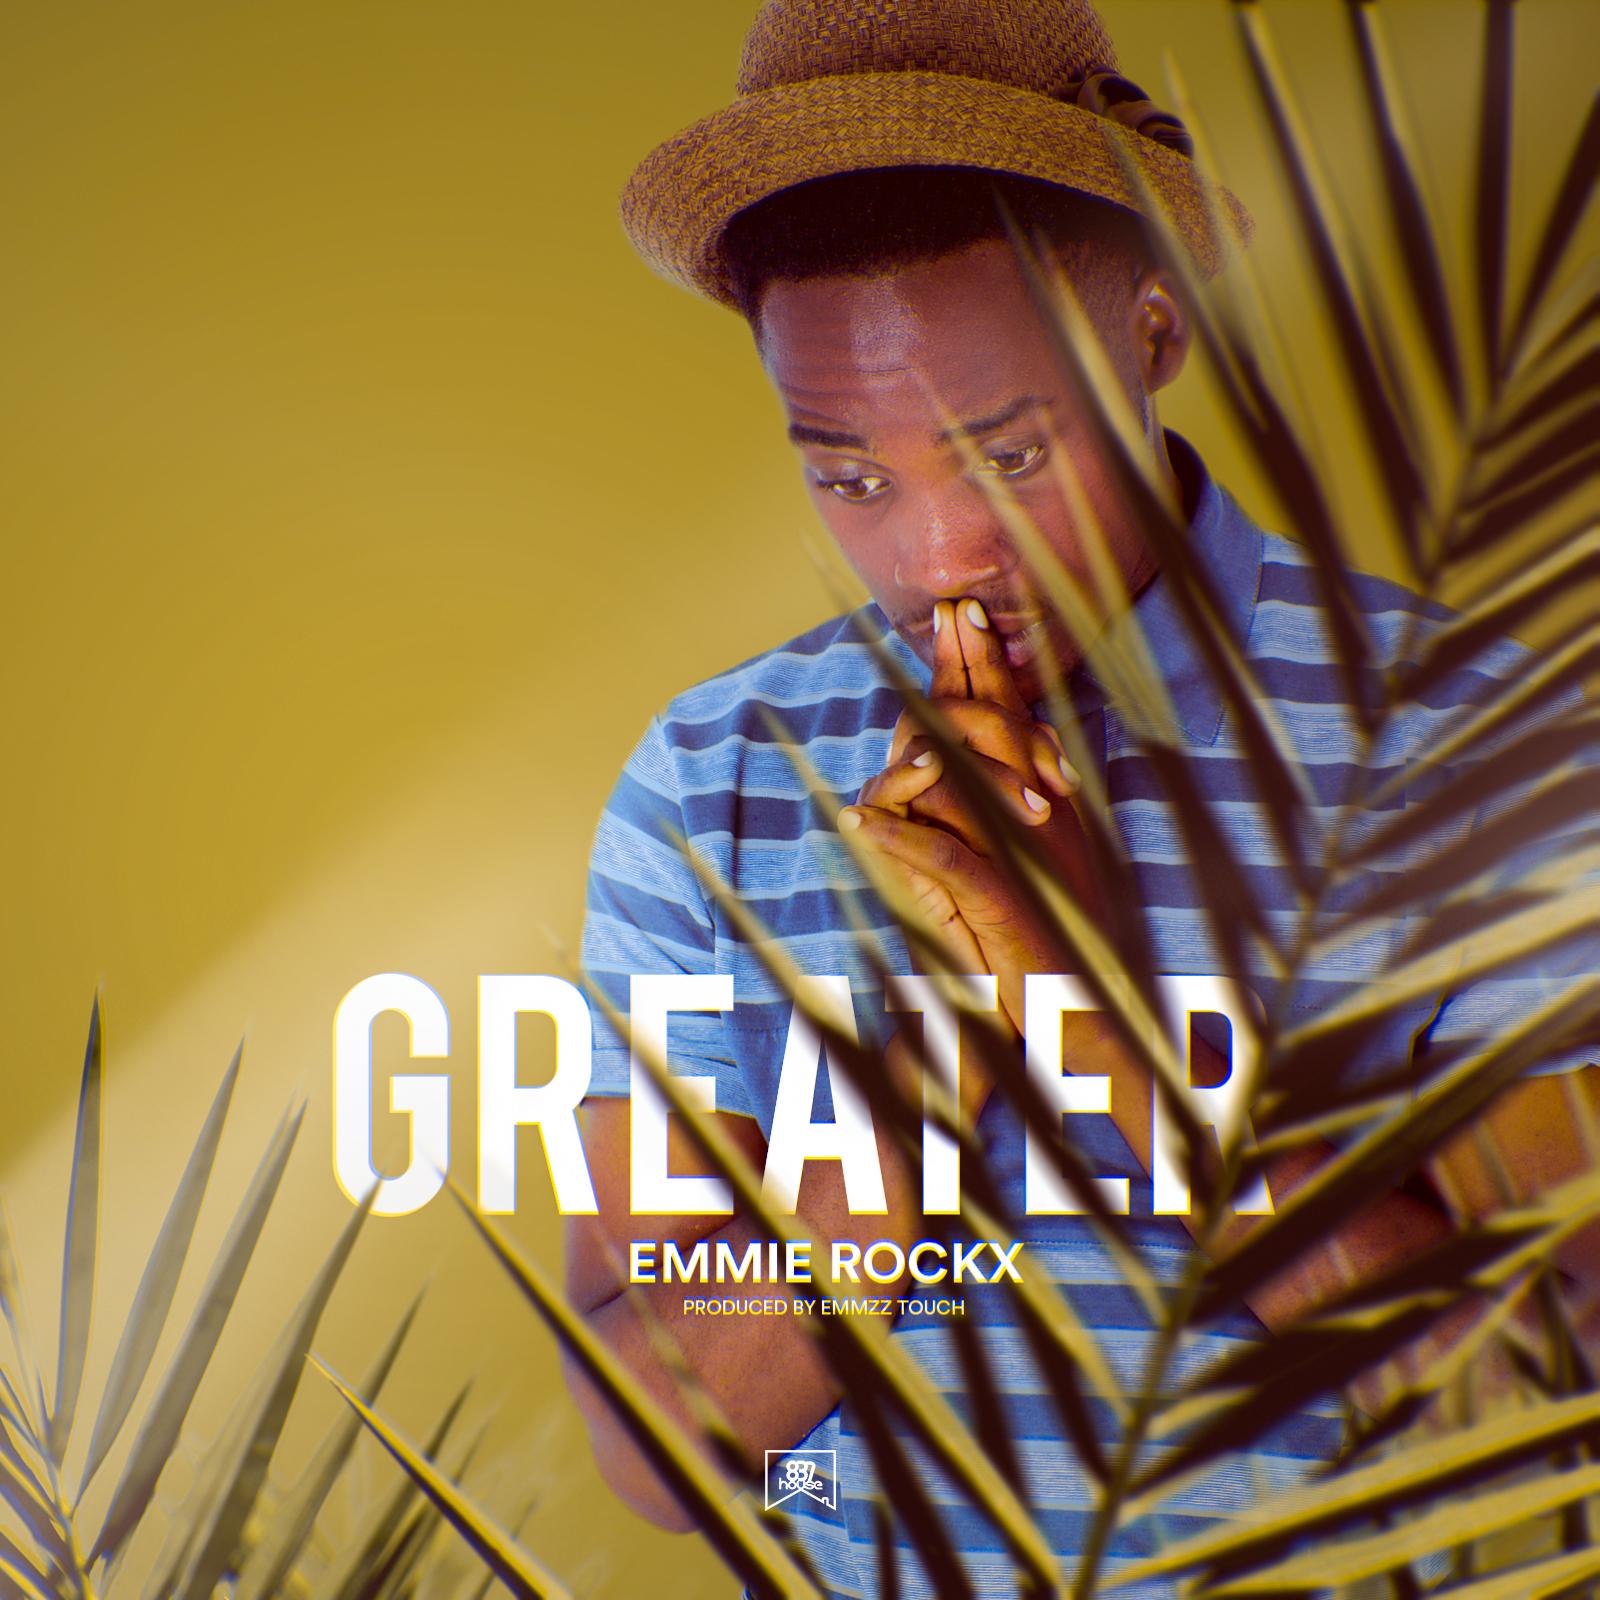 Emmie Rockx – Greater Prod By EmmzzTouch